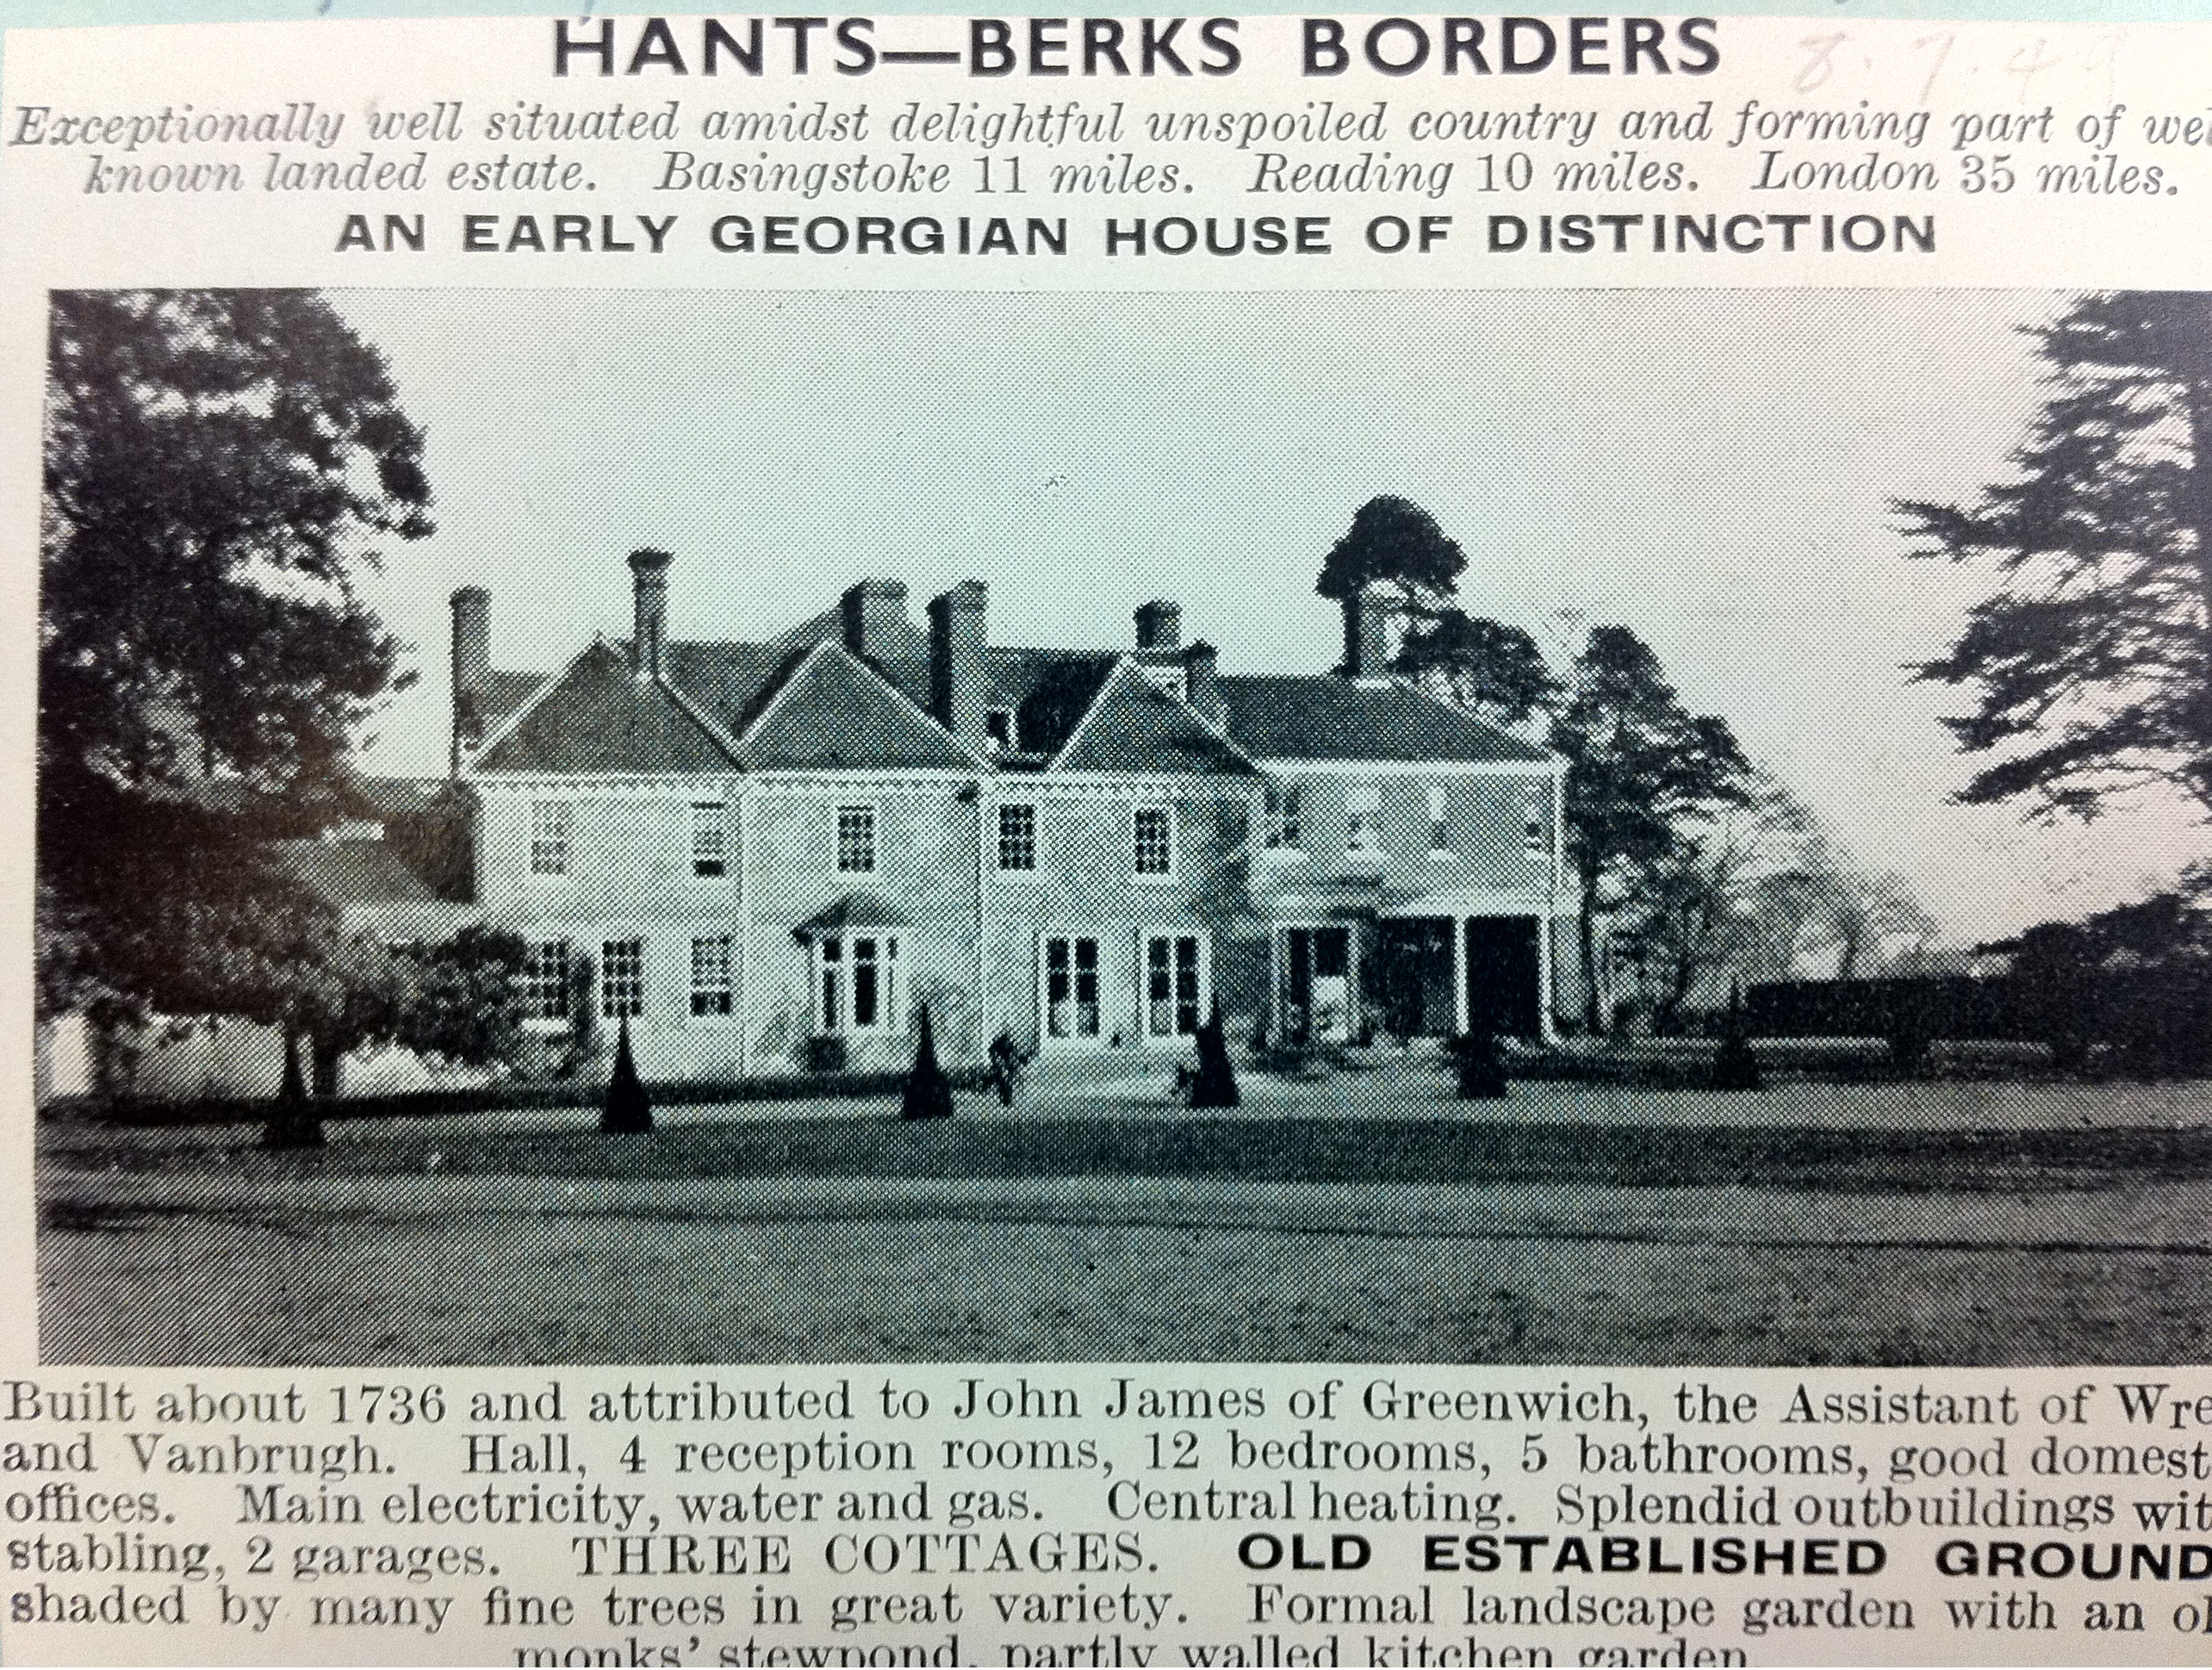 CU Hants - Berks Border advert